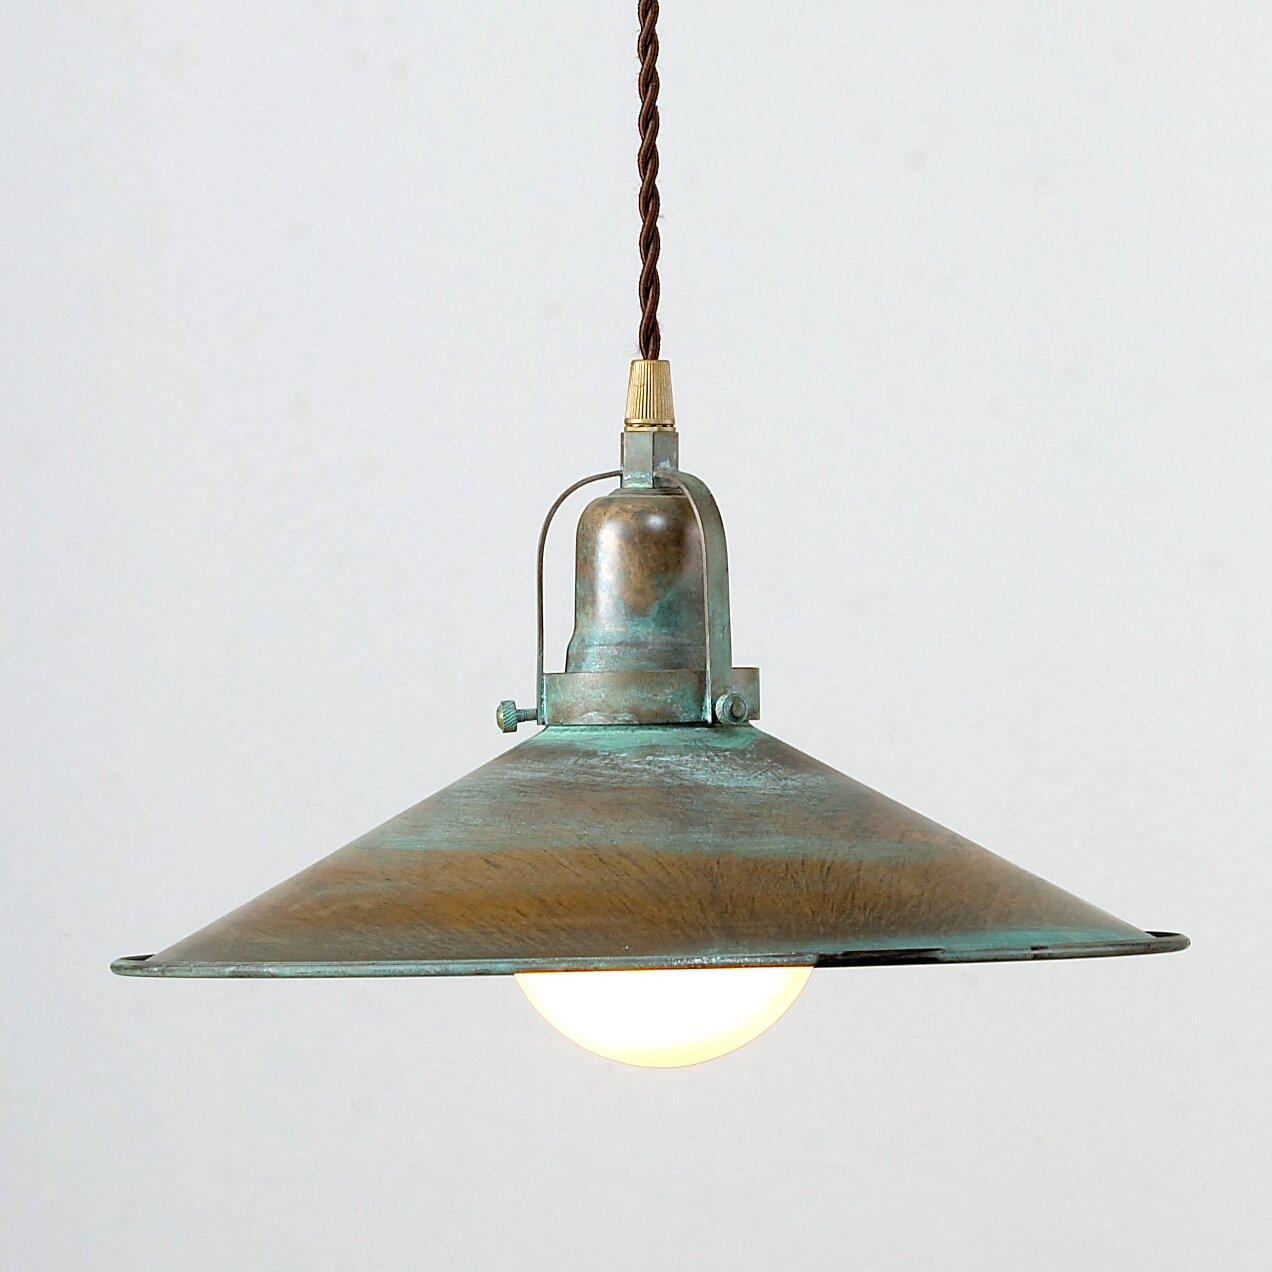 Lustrarte Lighting Rustic DAvo 1 Light Large Pendant